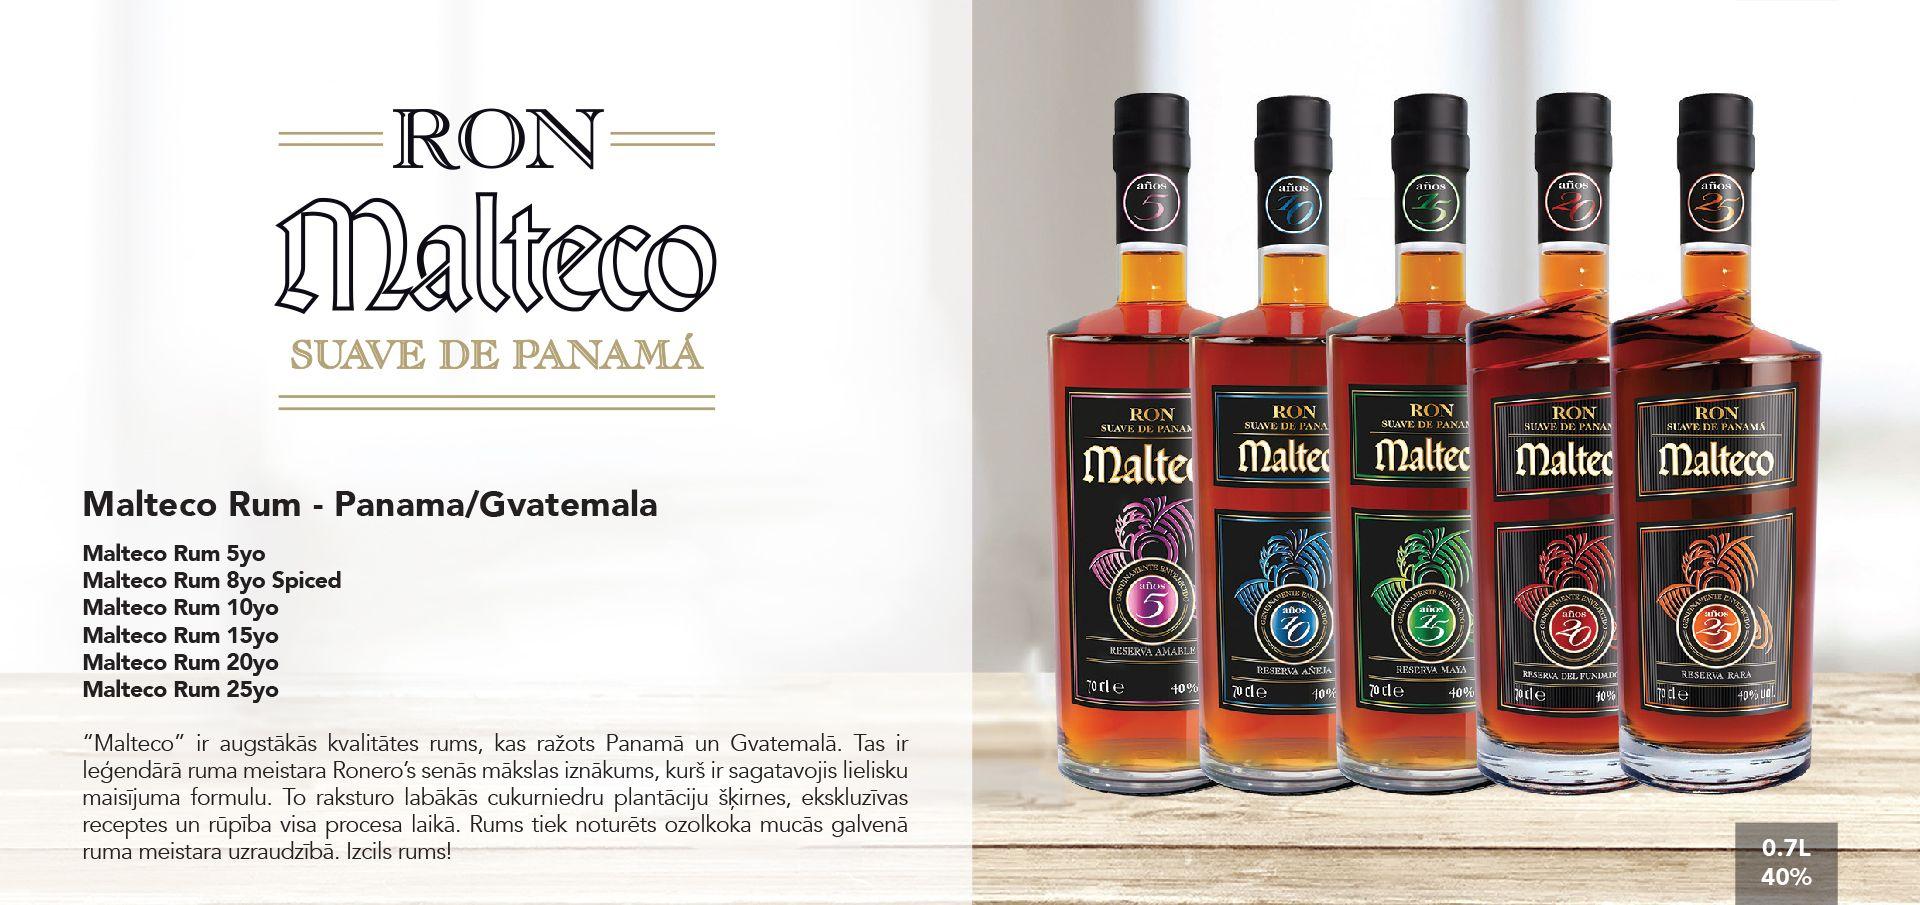 Malteco Rum - Panama/Gvatemala